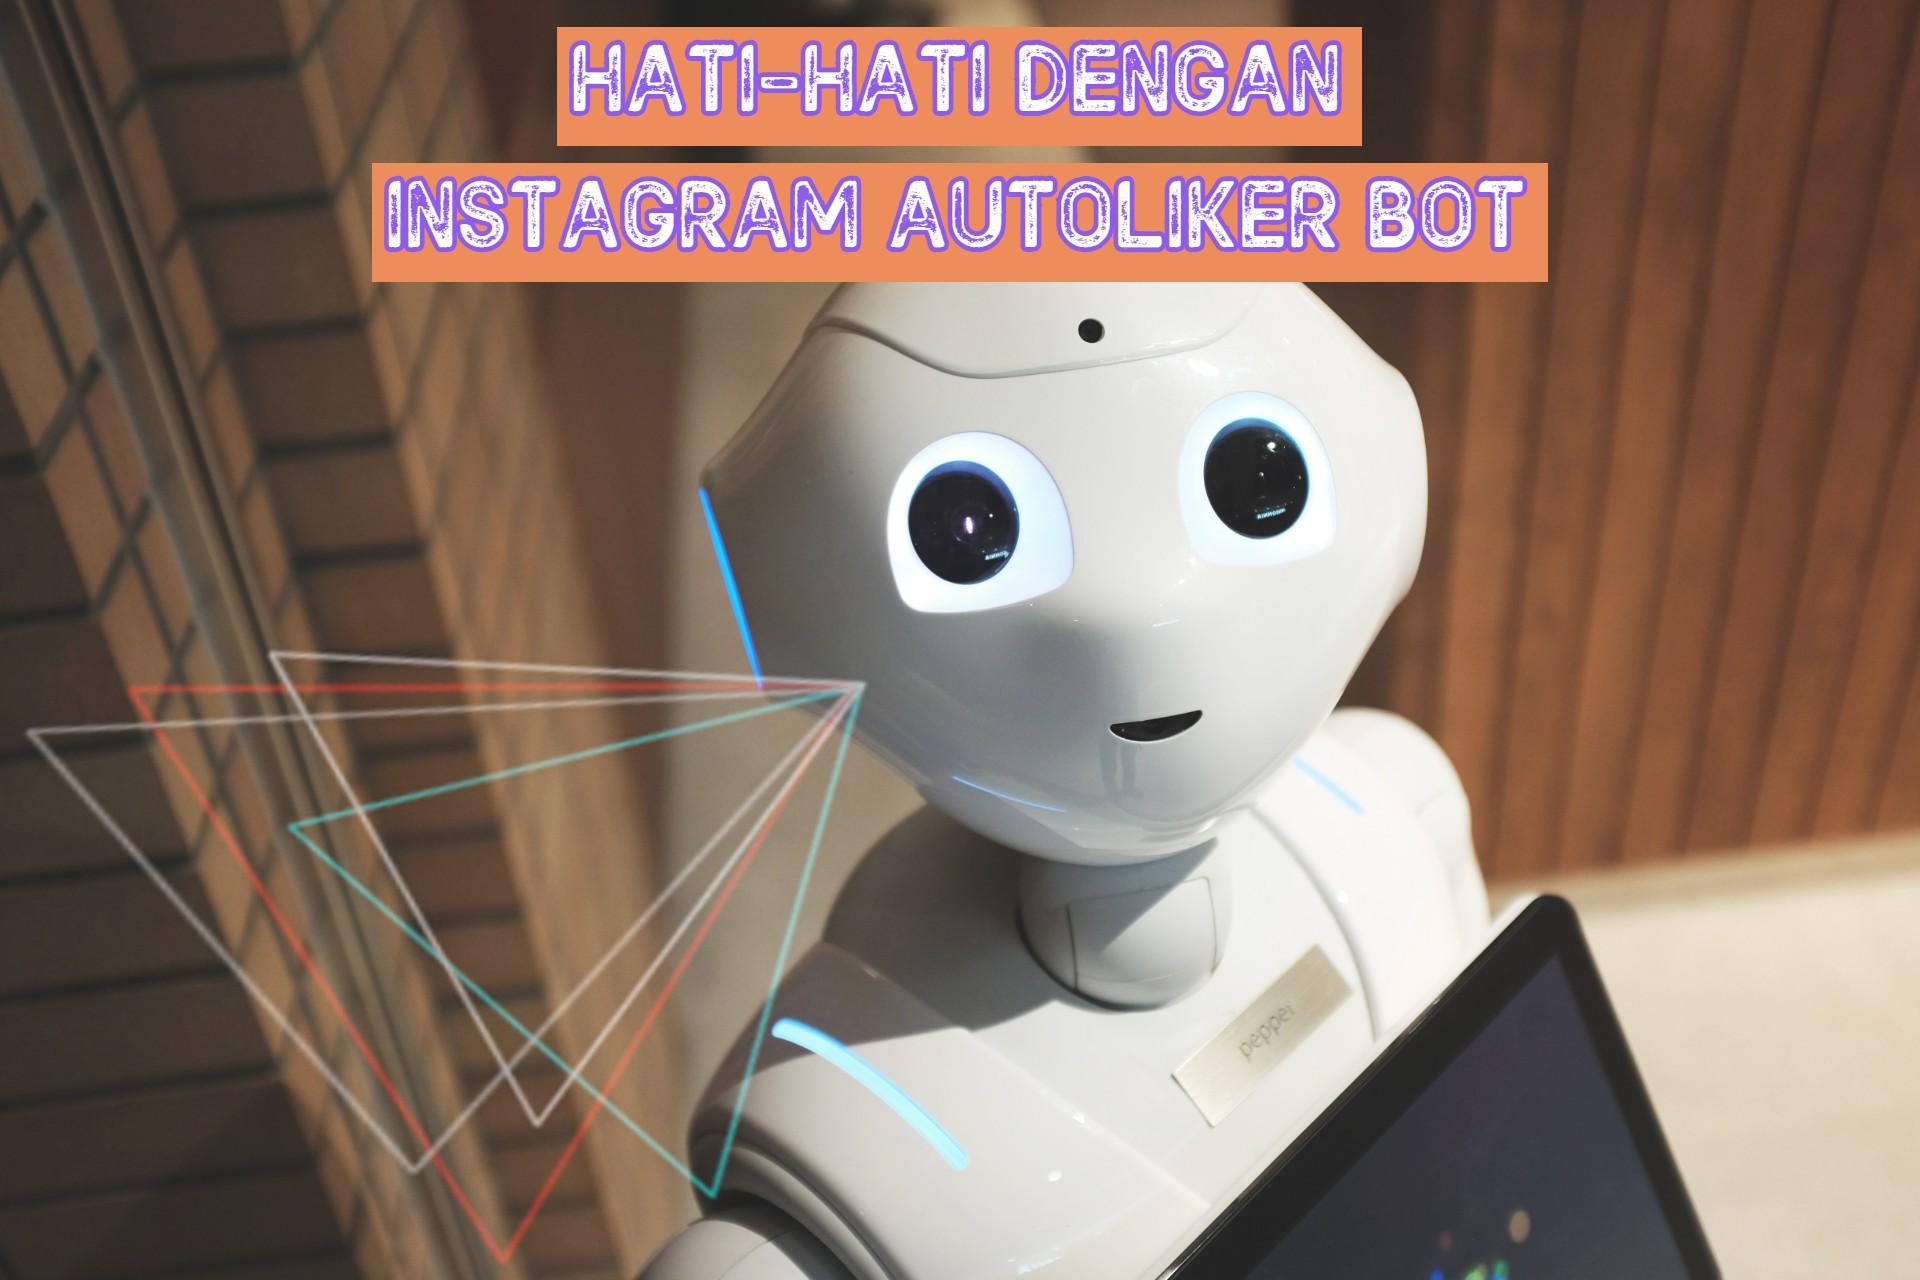 Hati-hati dengan Instagram Auto Likes Online 2019